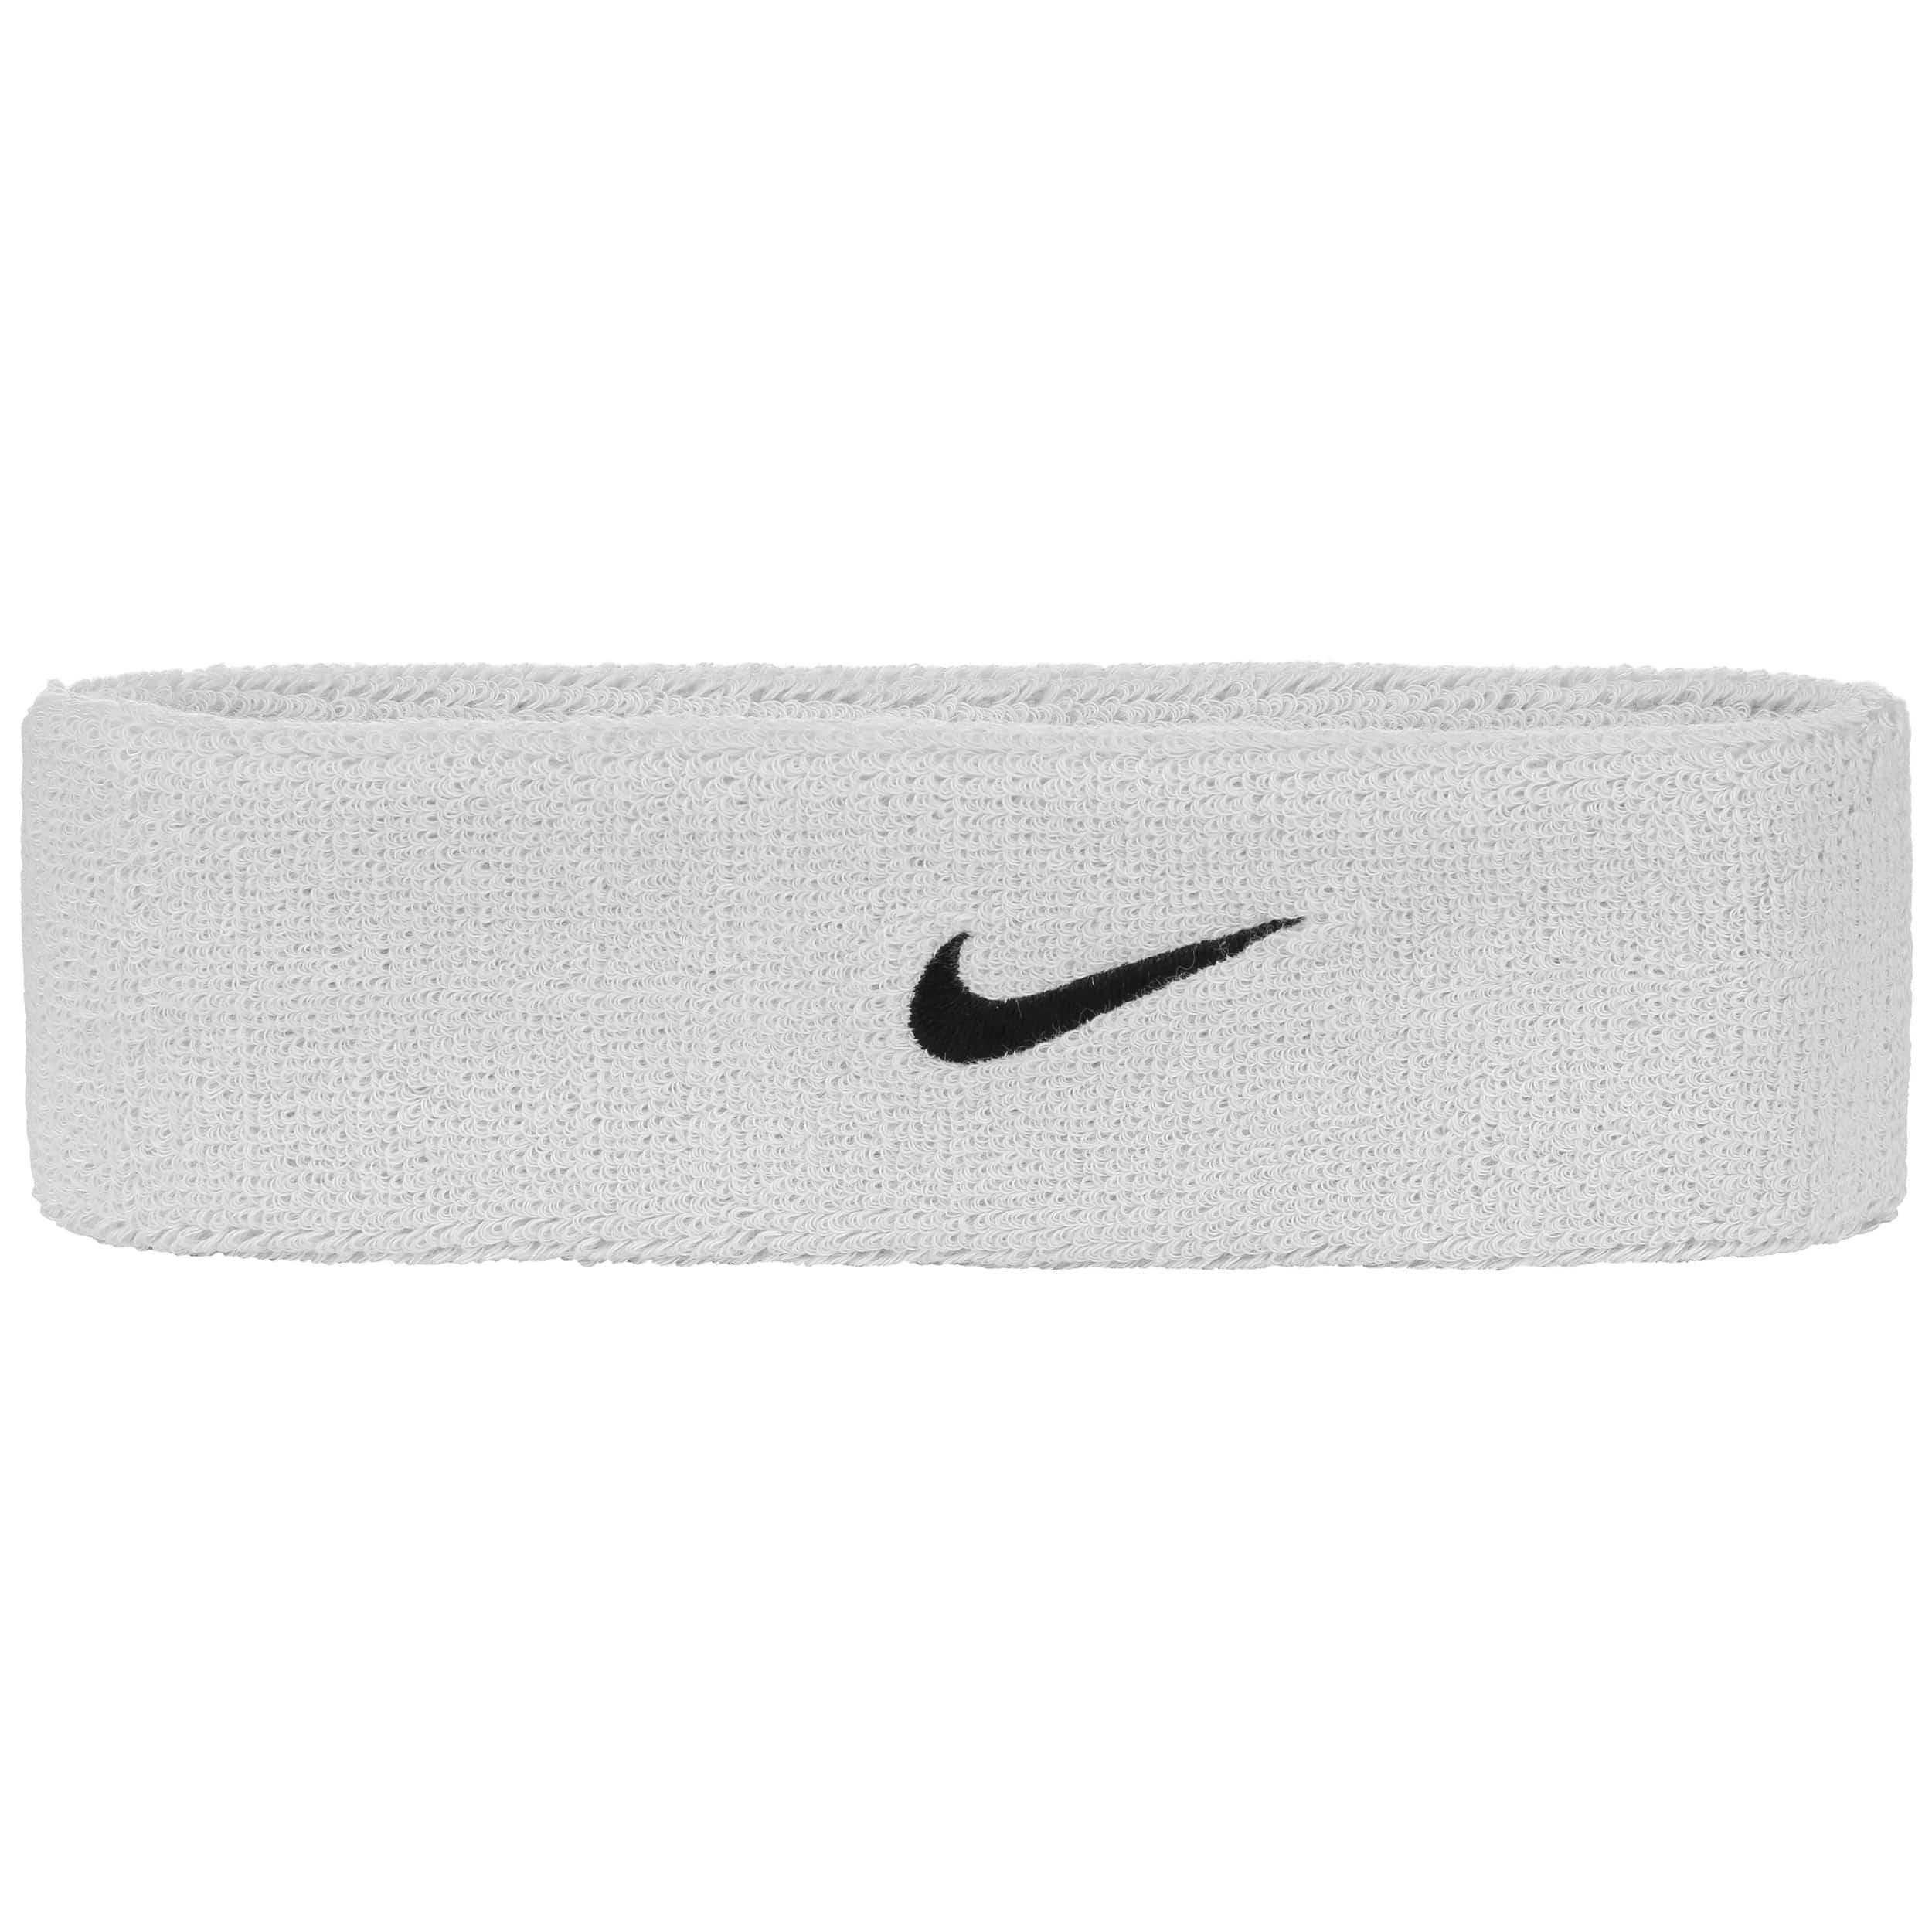 ... Swoosh Headband by Nike - white 2 ... 90f170b4579